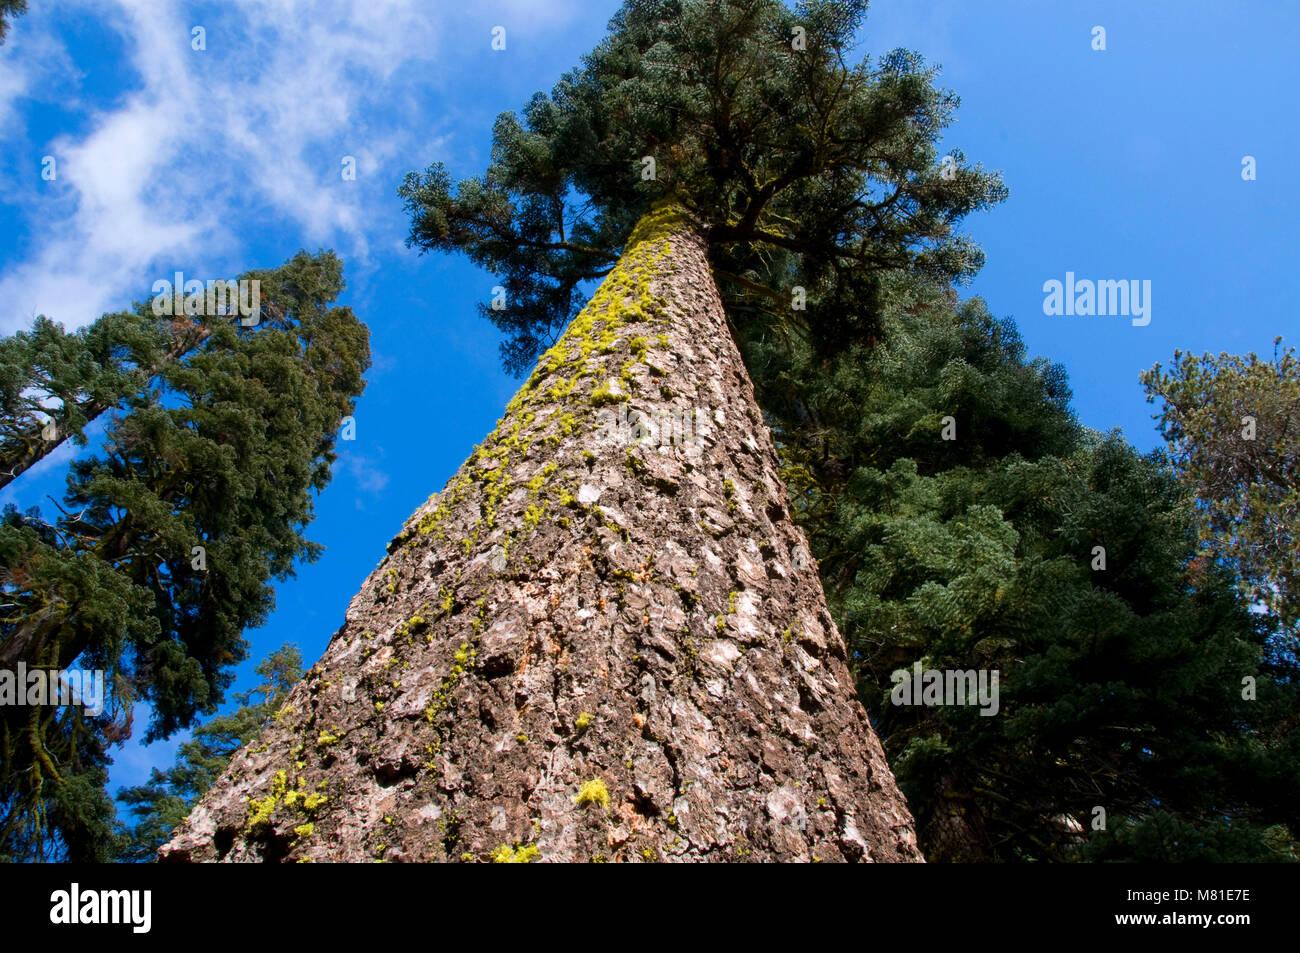 Shasta red fir, Yosemite National Park, California - Stock Image